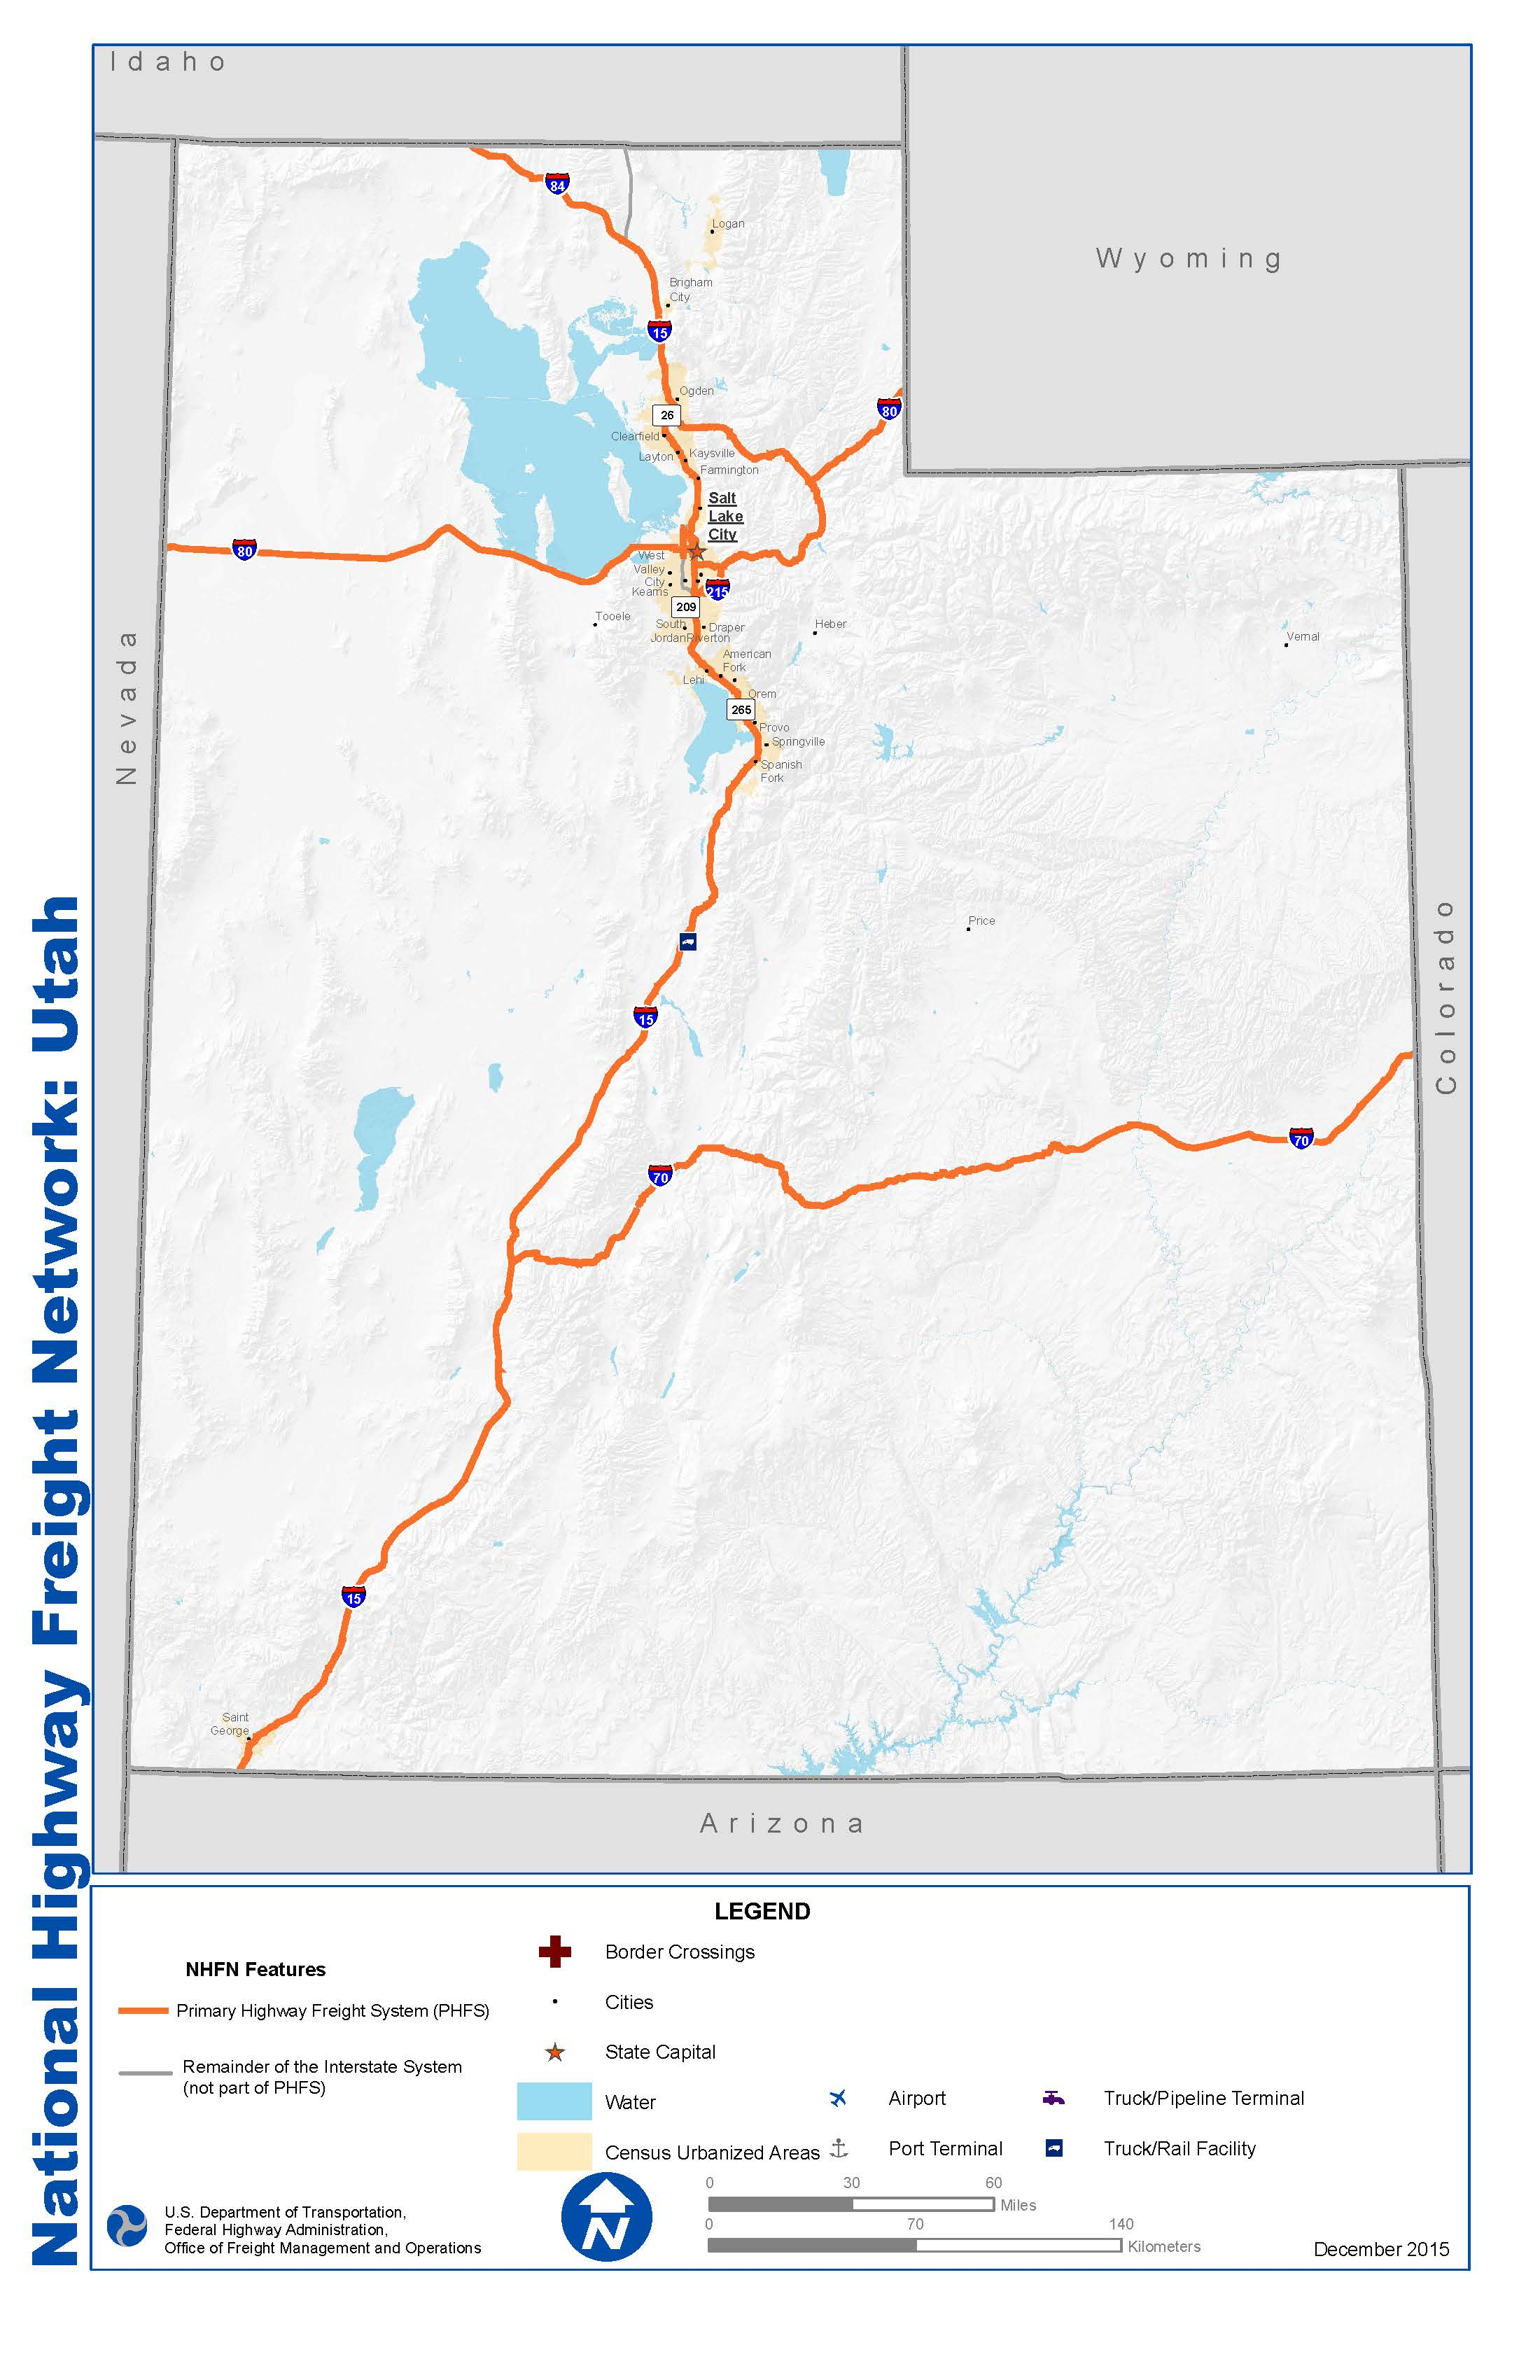 National Highway Freight Network Map and Tables for Utah ... on lake havasu arizona, polacca arizona, vail arizona, wickenburg arizona, parker arizona, florence arizona, kingman arizona, alpine arizona, williams arizona, tempe arizona, avondale arizona, peoria arizona, tuscon arizona, pinetop arizona, road map arizona, prescott arizona, antelope canyon arizona, surprise arizona, glendale arizona, maricopa arizona,